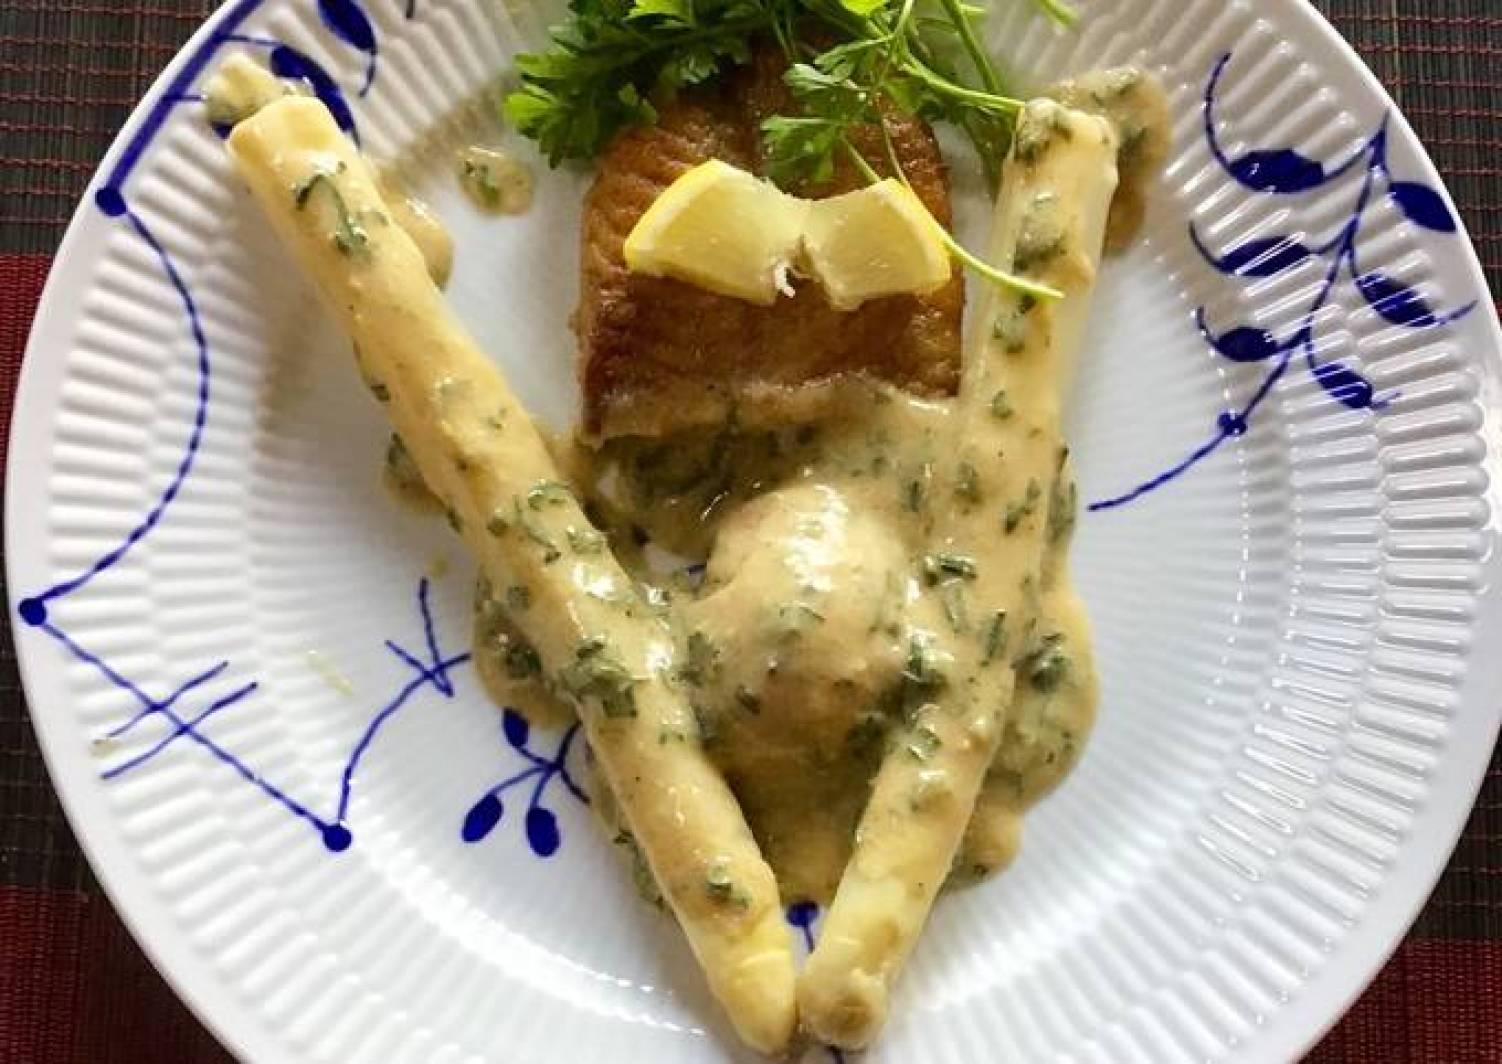 Meunierestegt slethvarfilet med asparges, nye kartofler og snyde bearnaisesovs